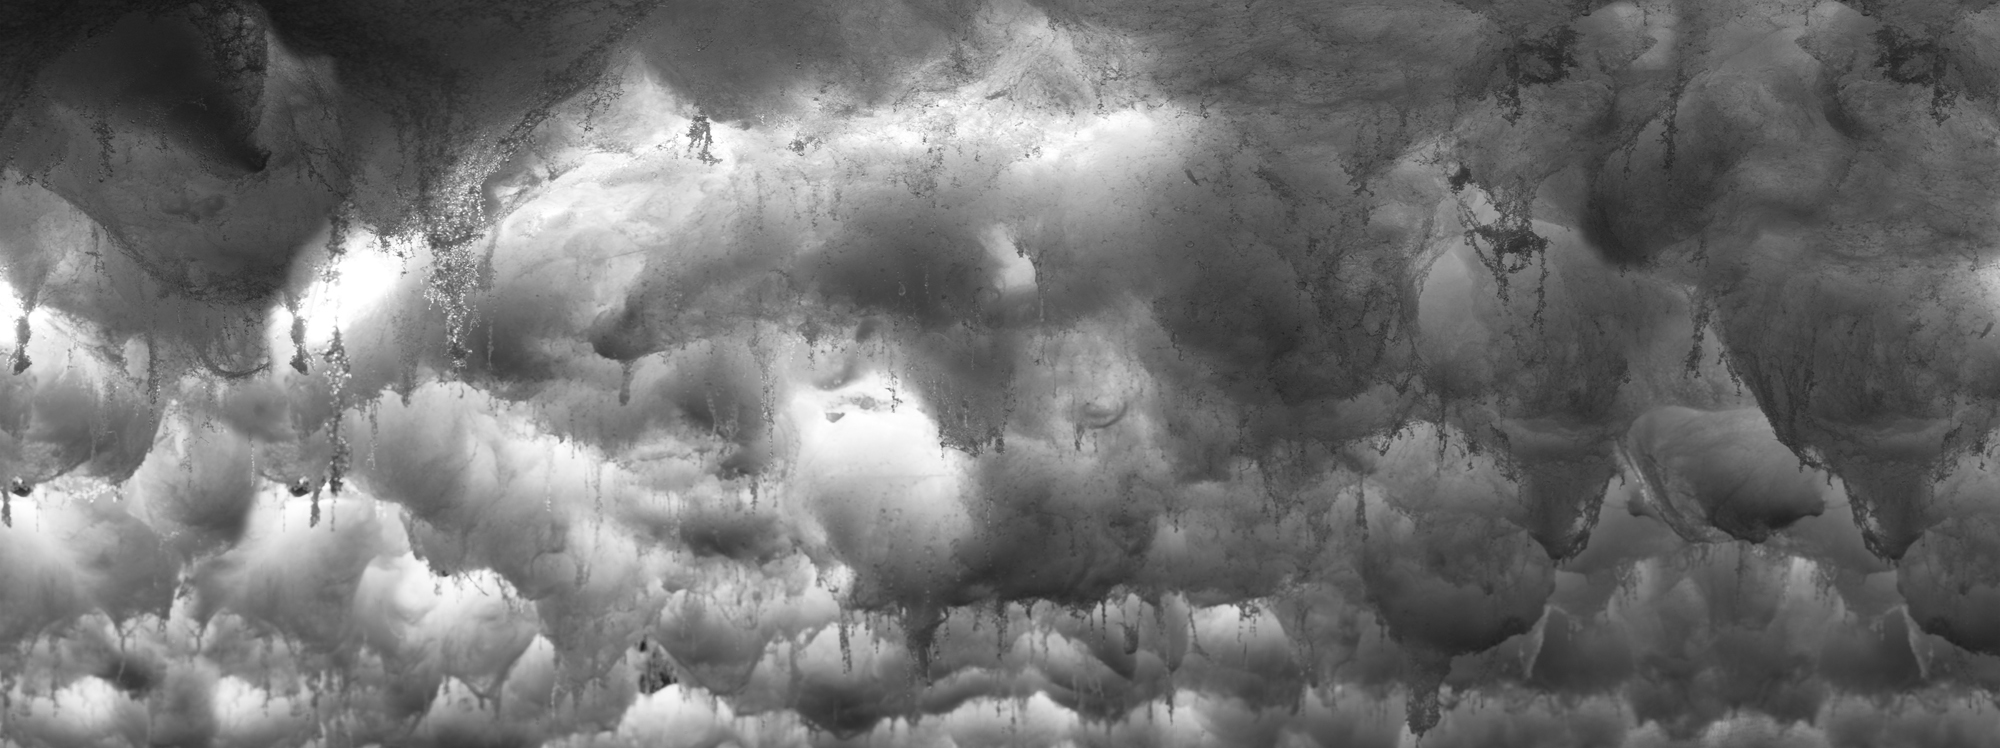 DAVID LAWRY & JAKI MIDDLETON  Downfall #6  2016 c-type metallic print edition of 5 + 1 AP 126 × 48 cm